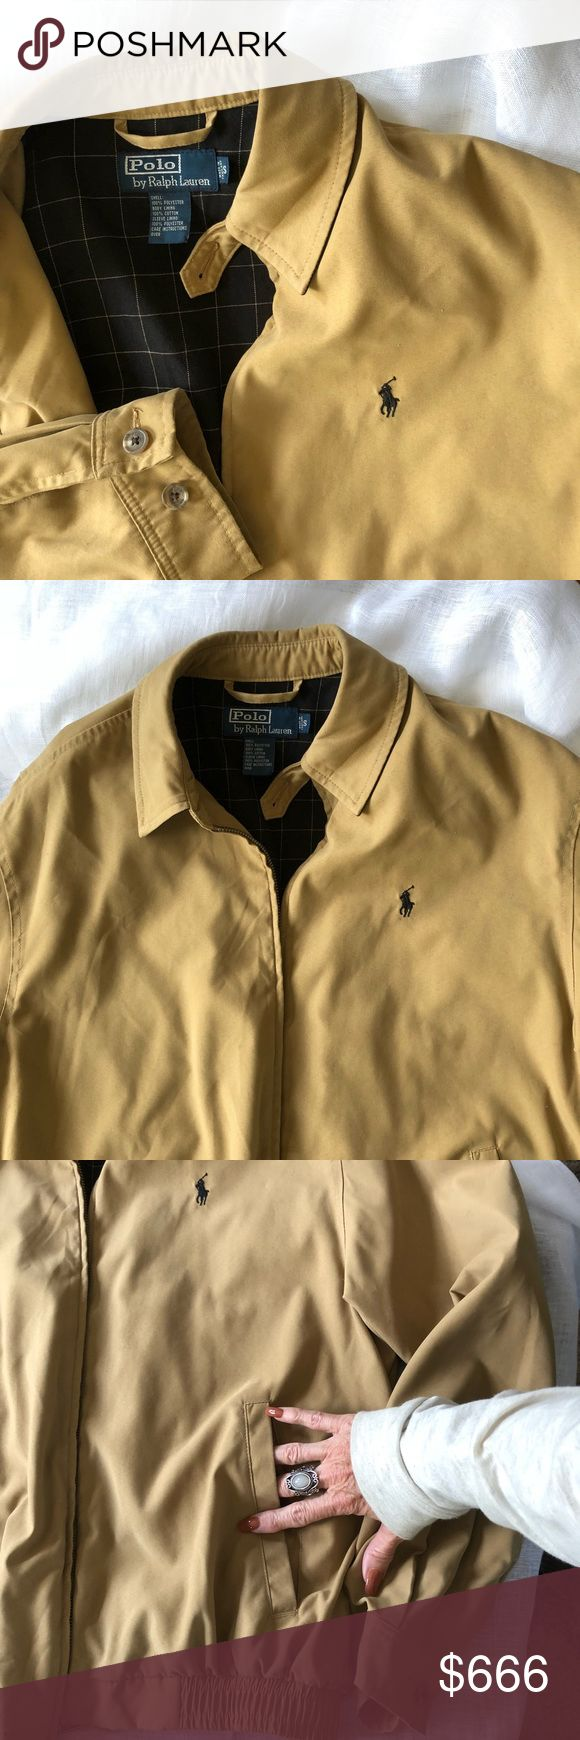 Ralph Lauren light weight, lined full zip jacket Doeskin